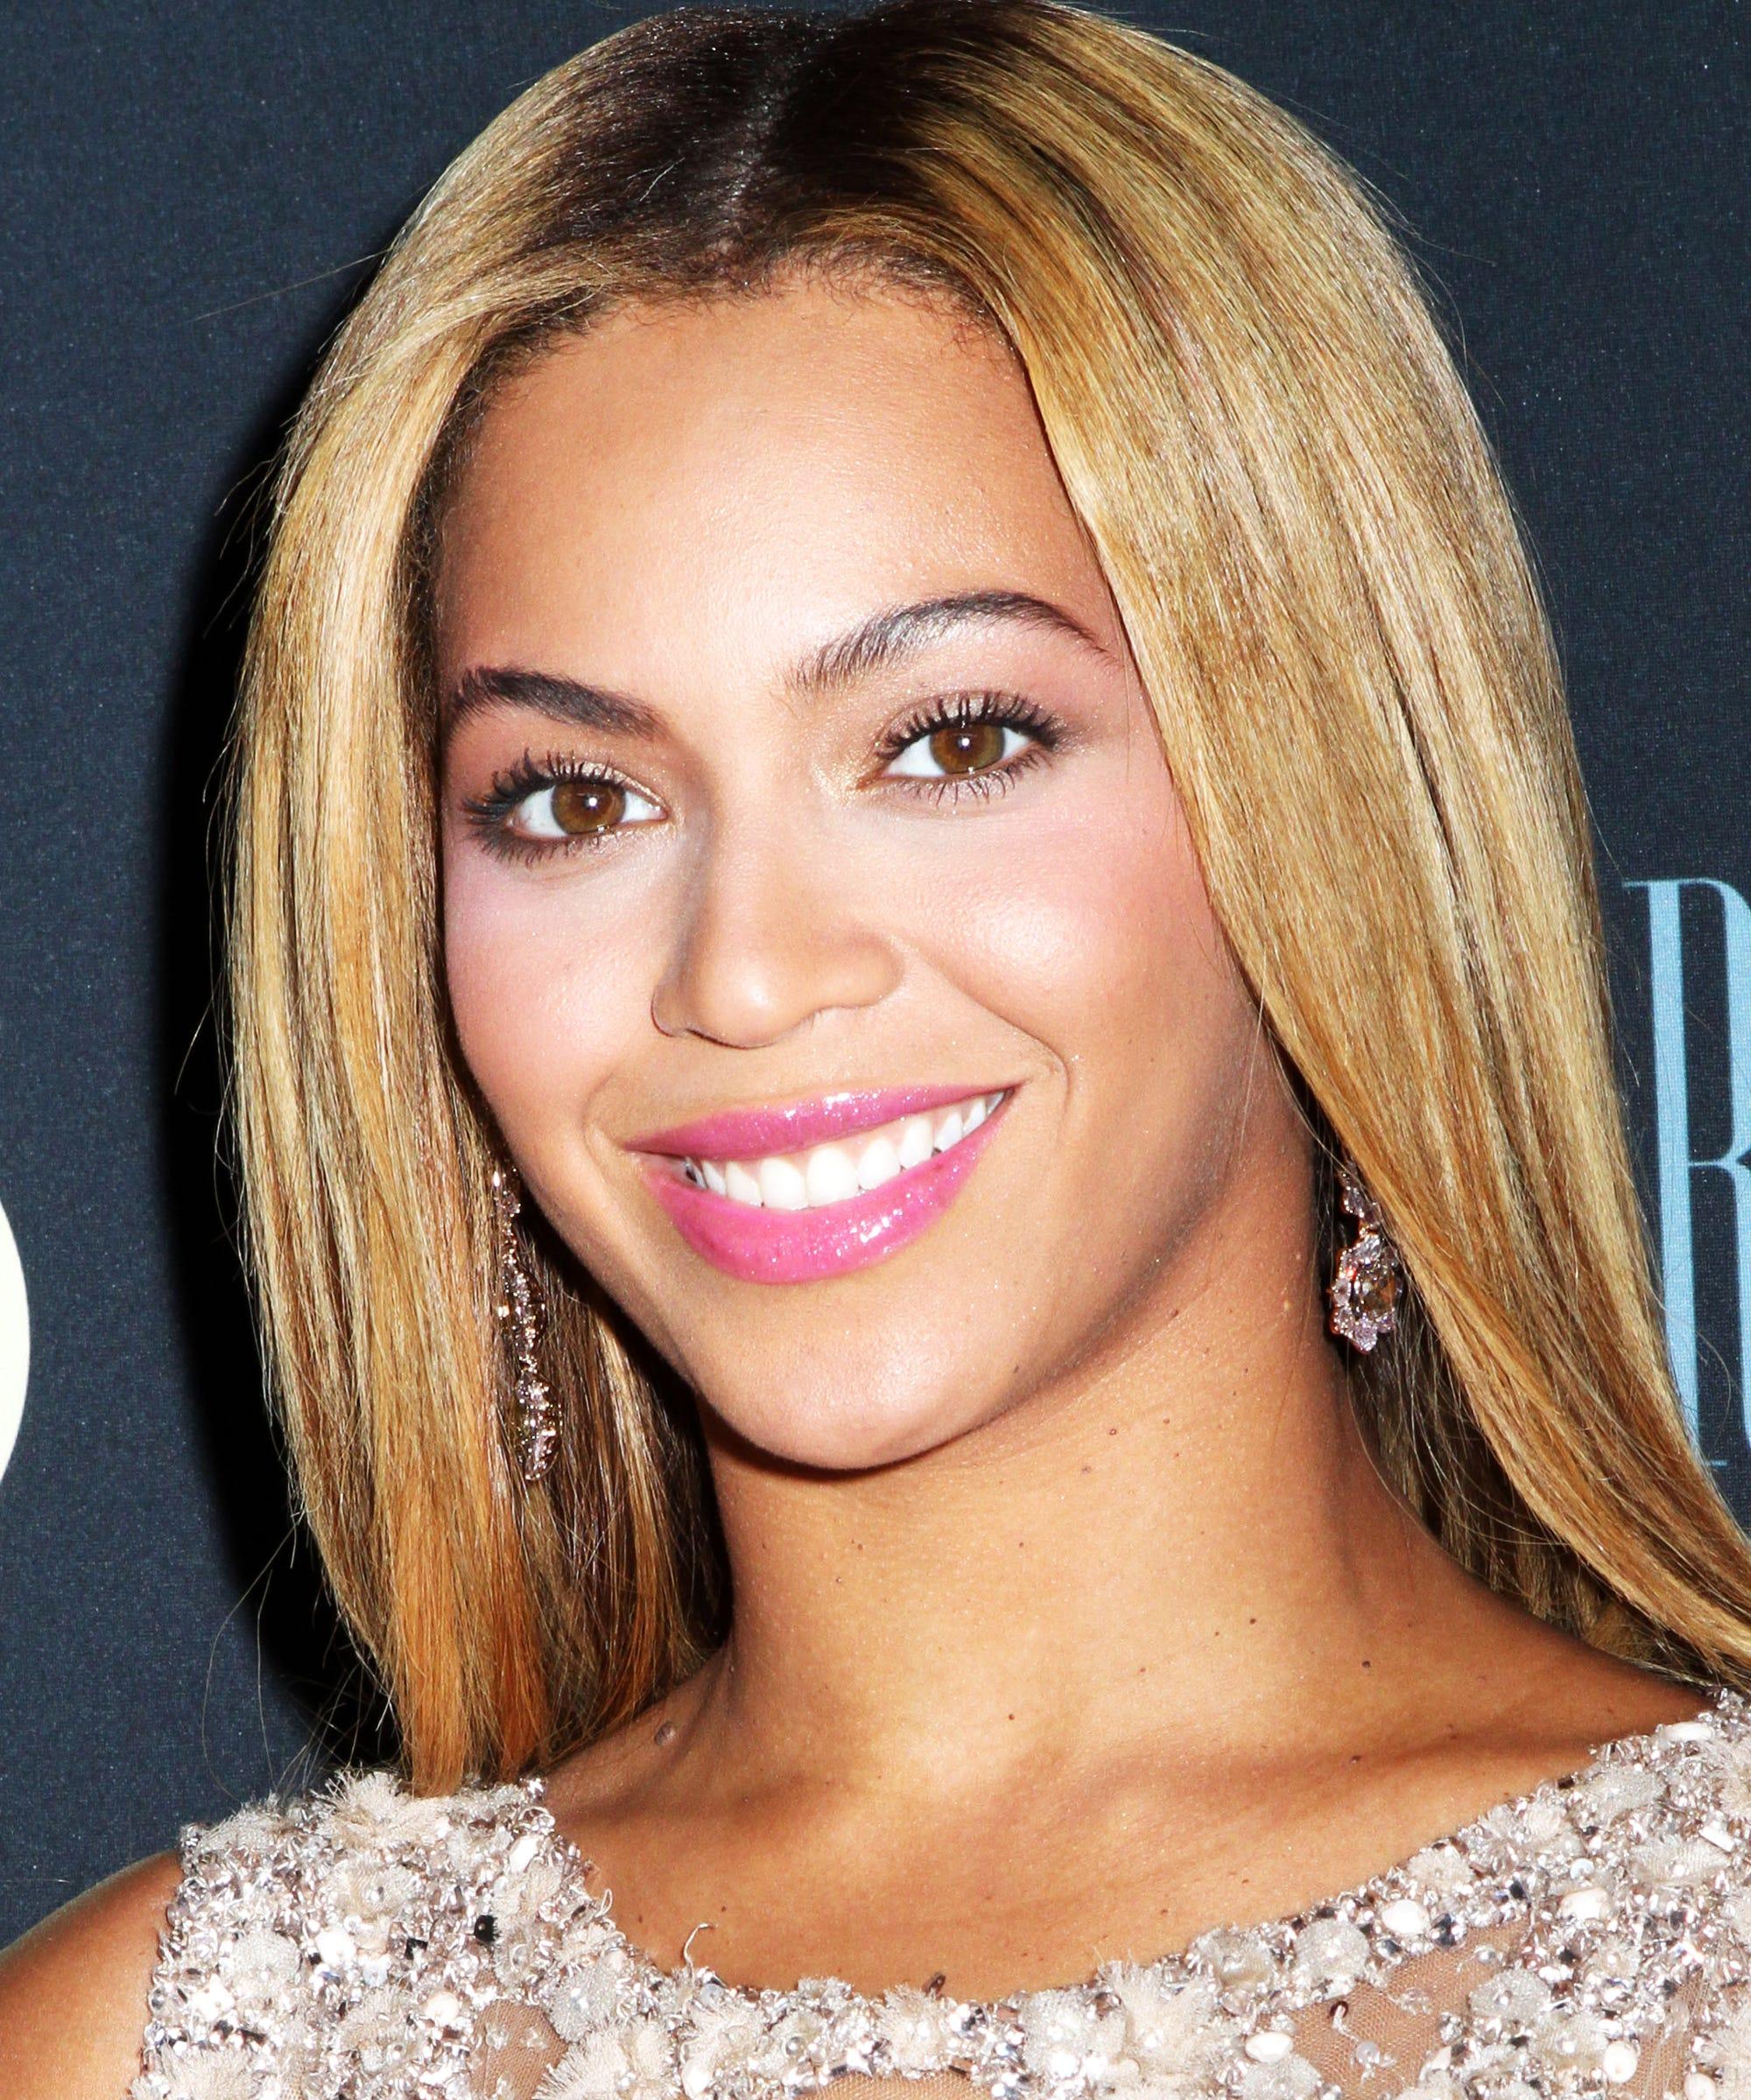 BeyonceOpener